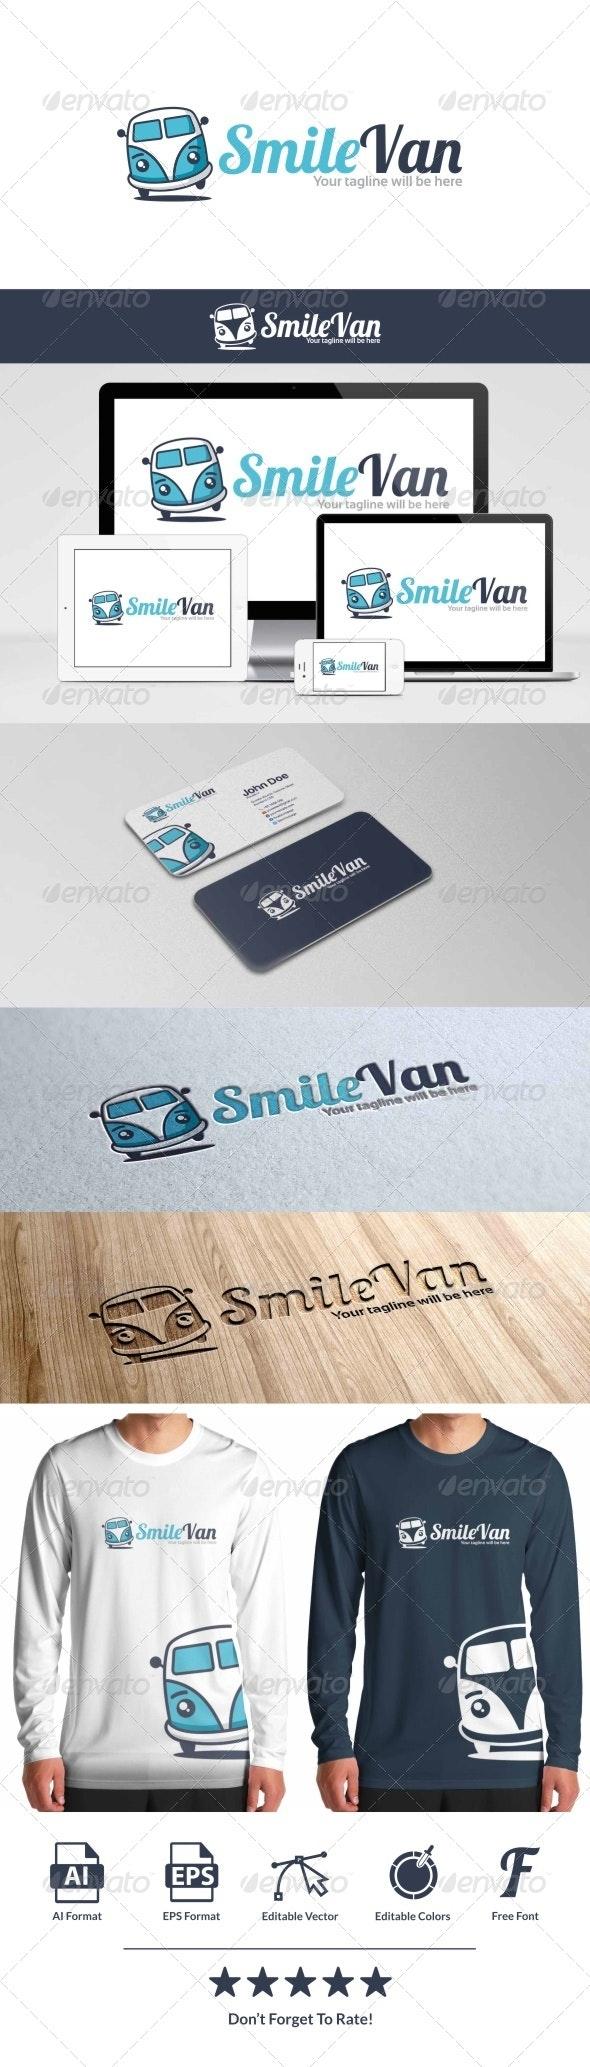 Smile Van Logo - Objects Logo Templates